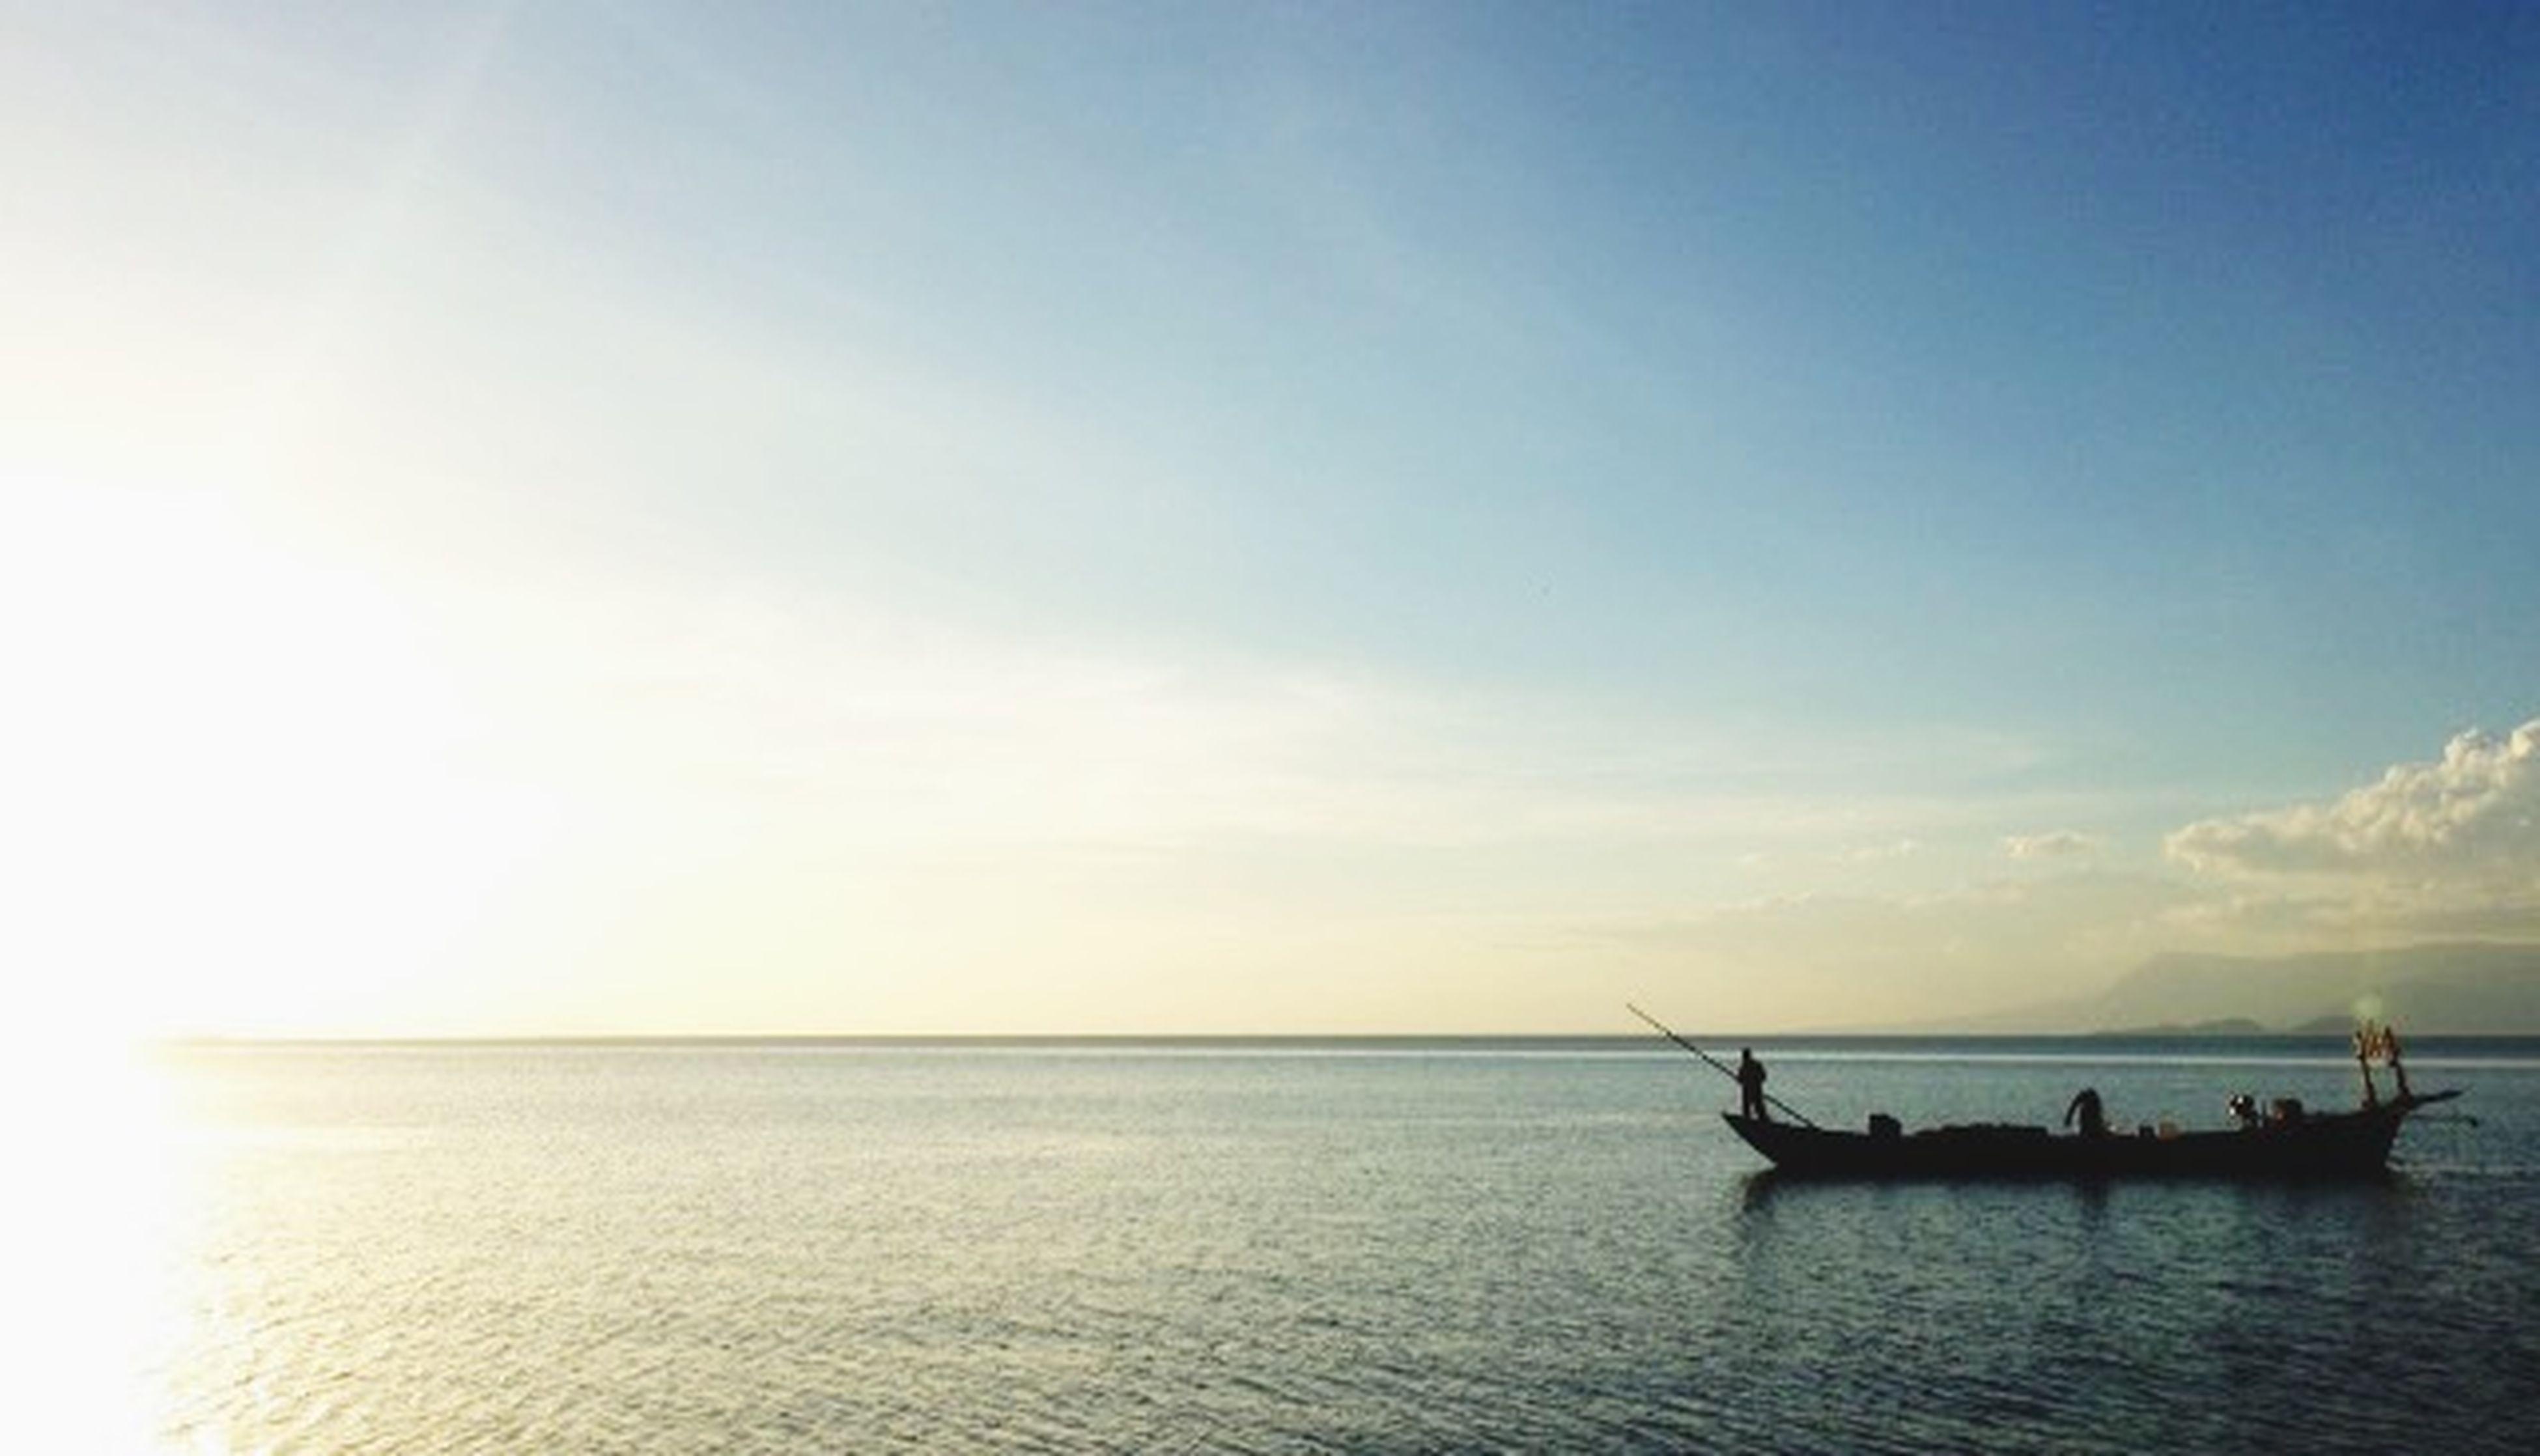 Life of fisherman Sea Sunsetphotographs Fisherman